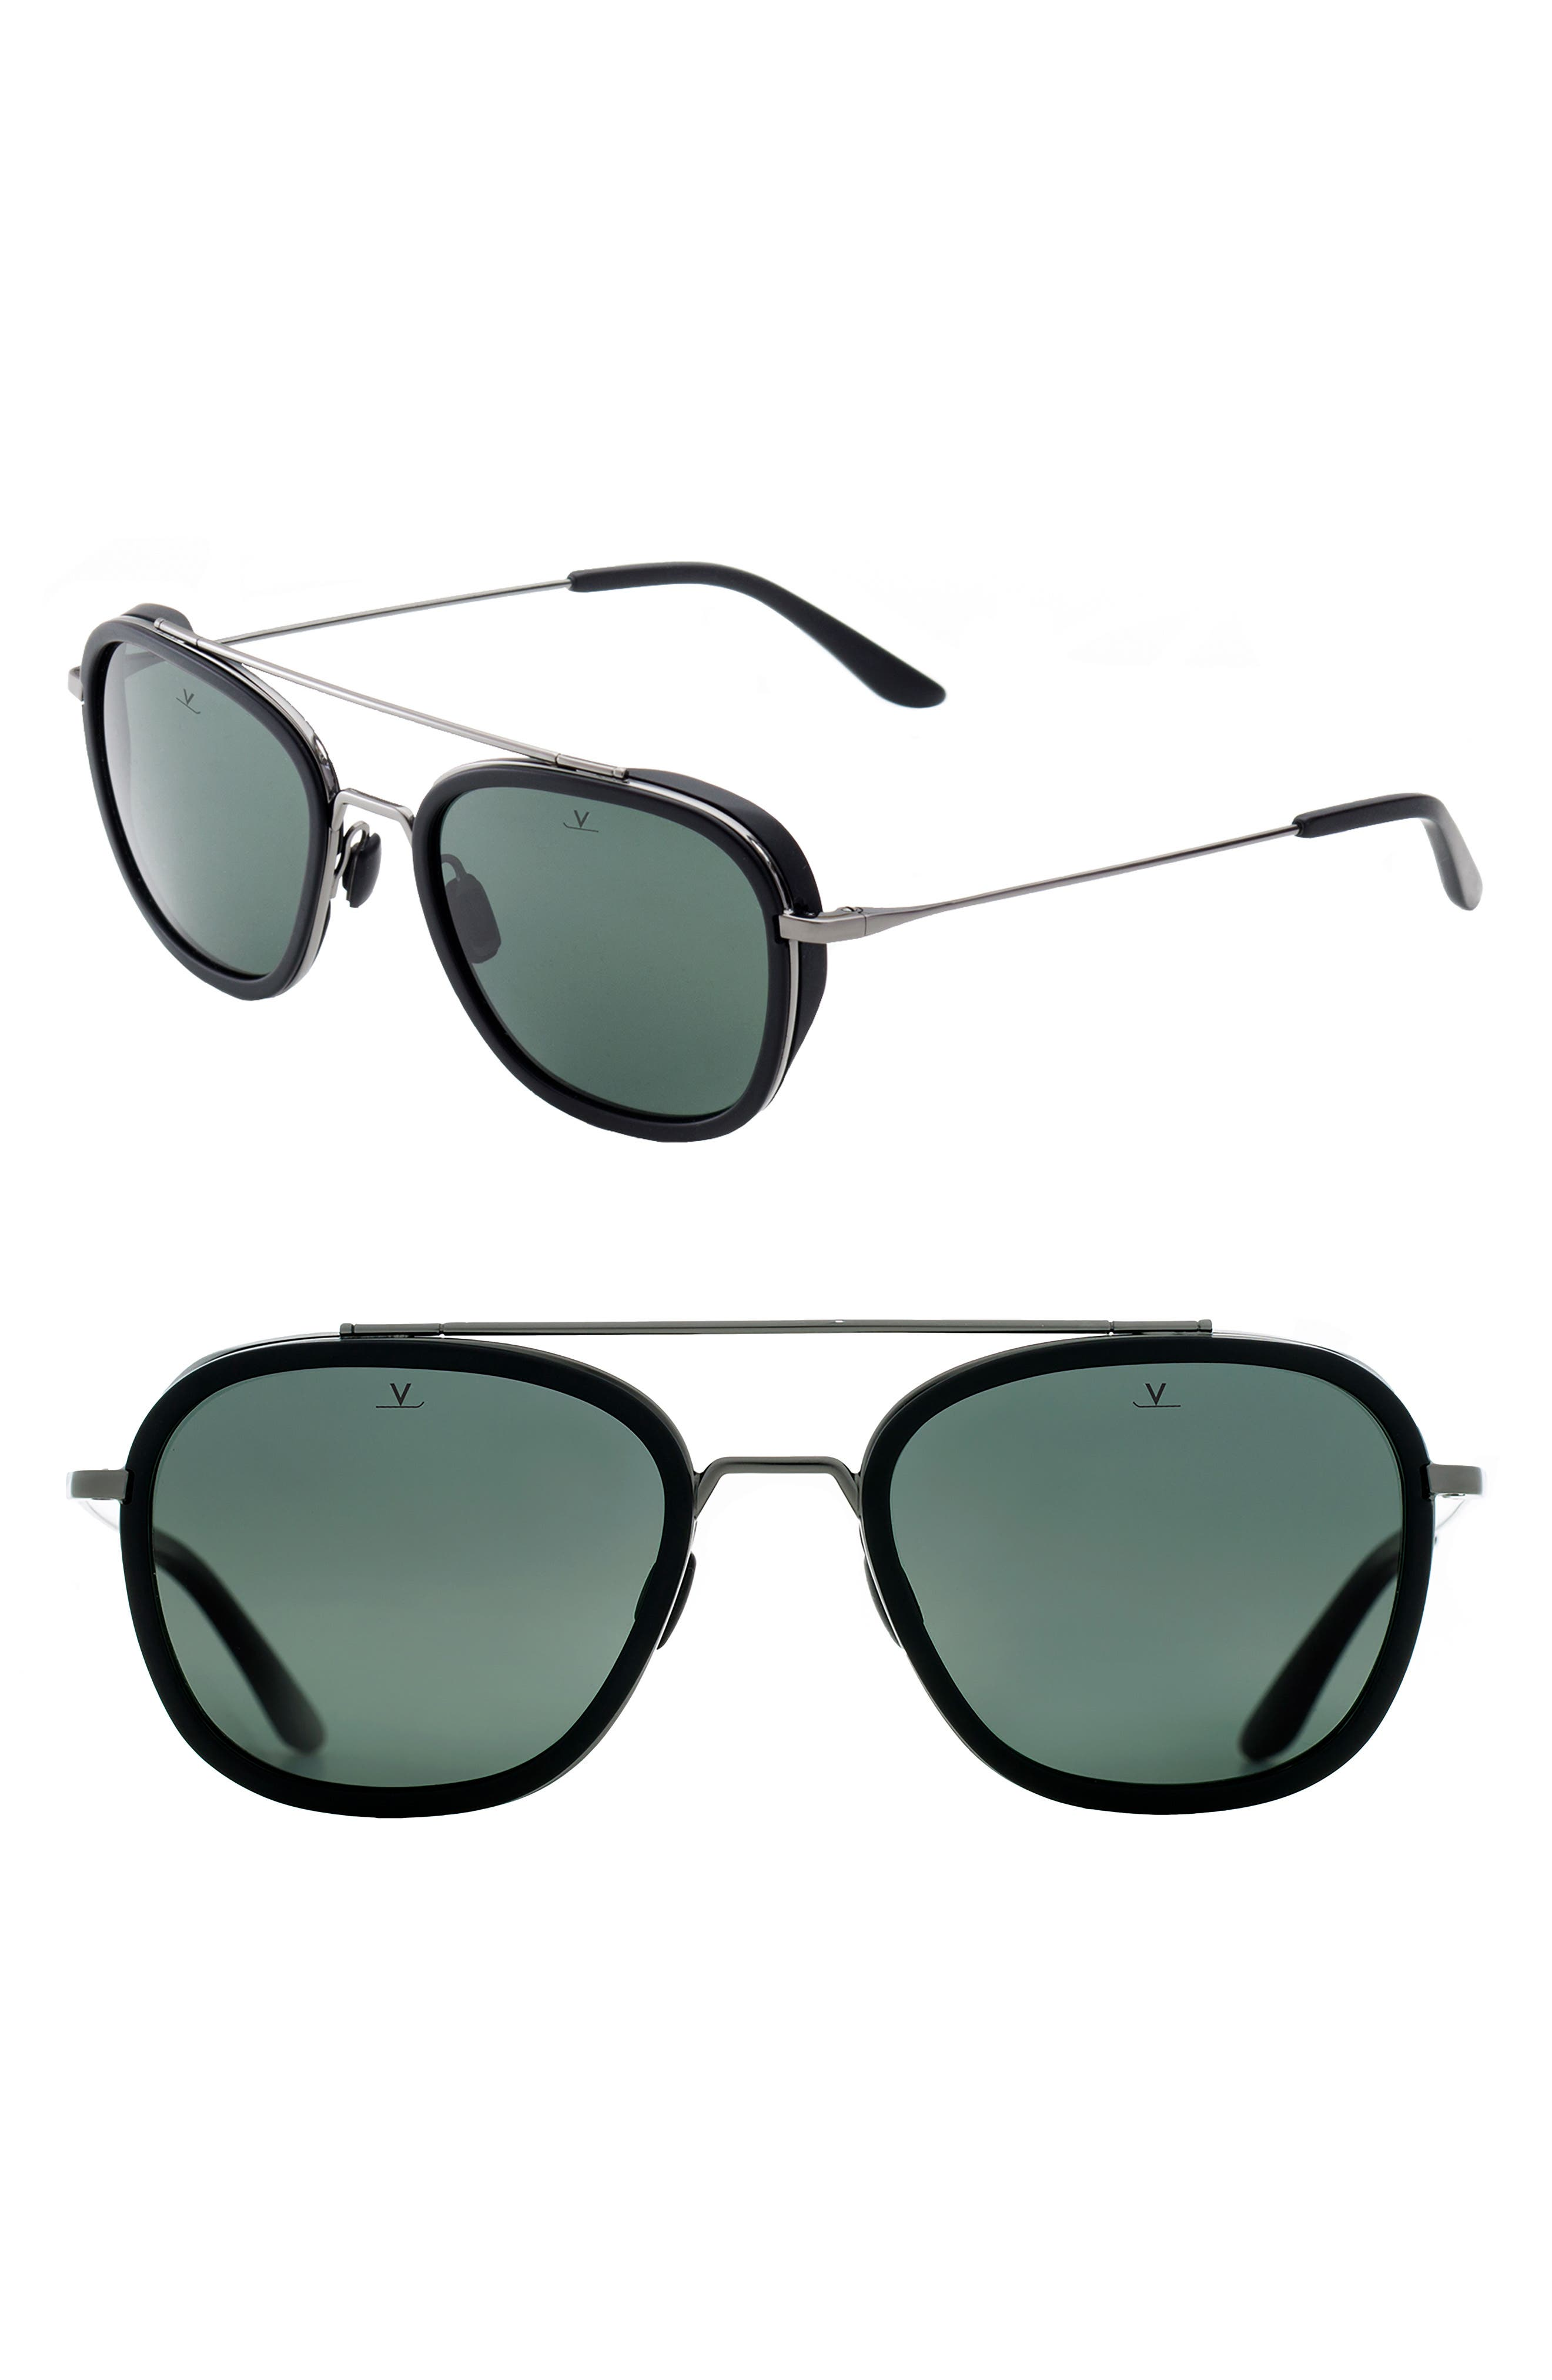 Glacier 54mm Polarized Aviator Sunglasses,                         Main,                         color, MATT BLACK/ GUNMETAL